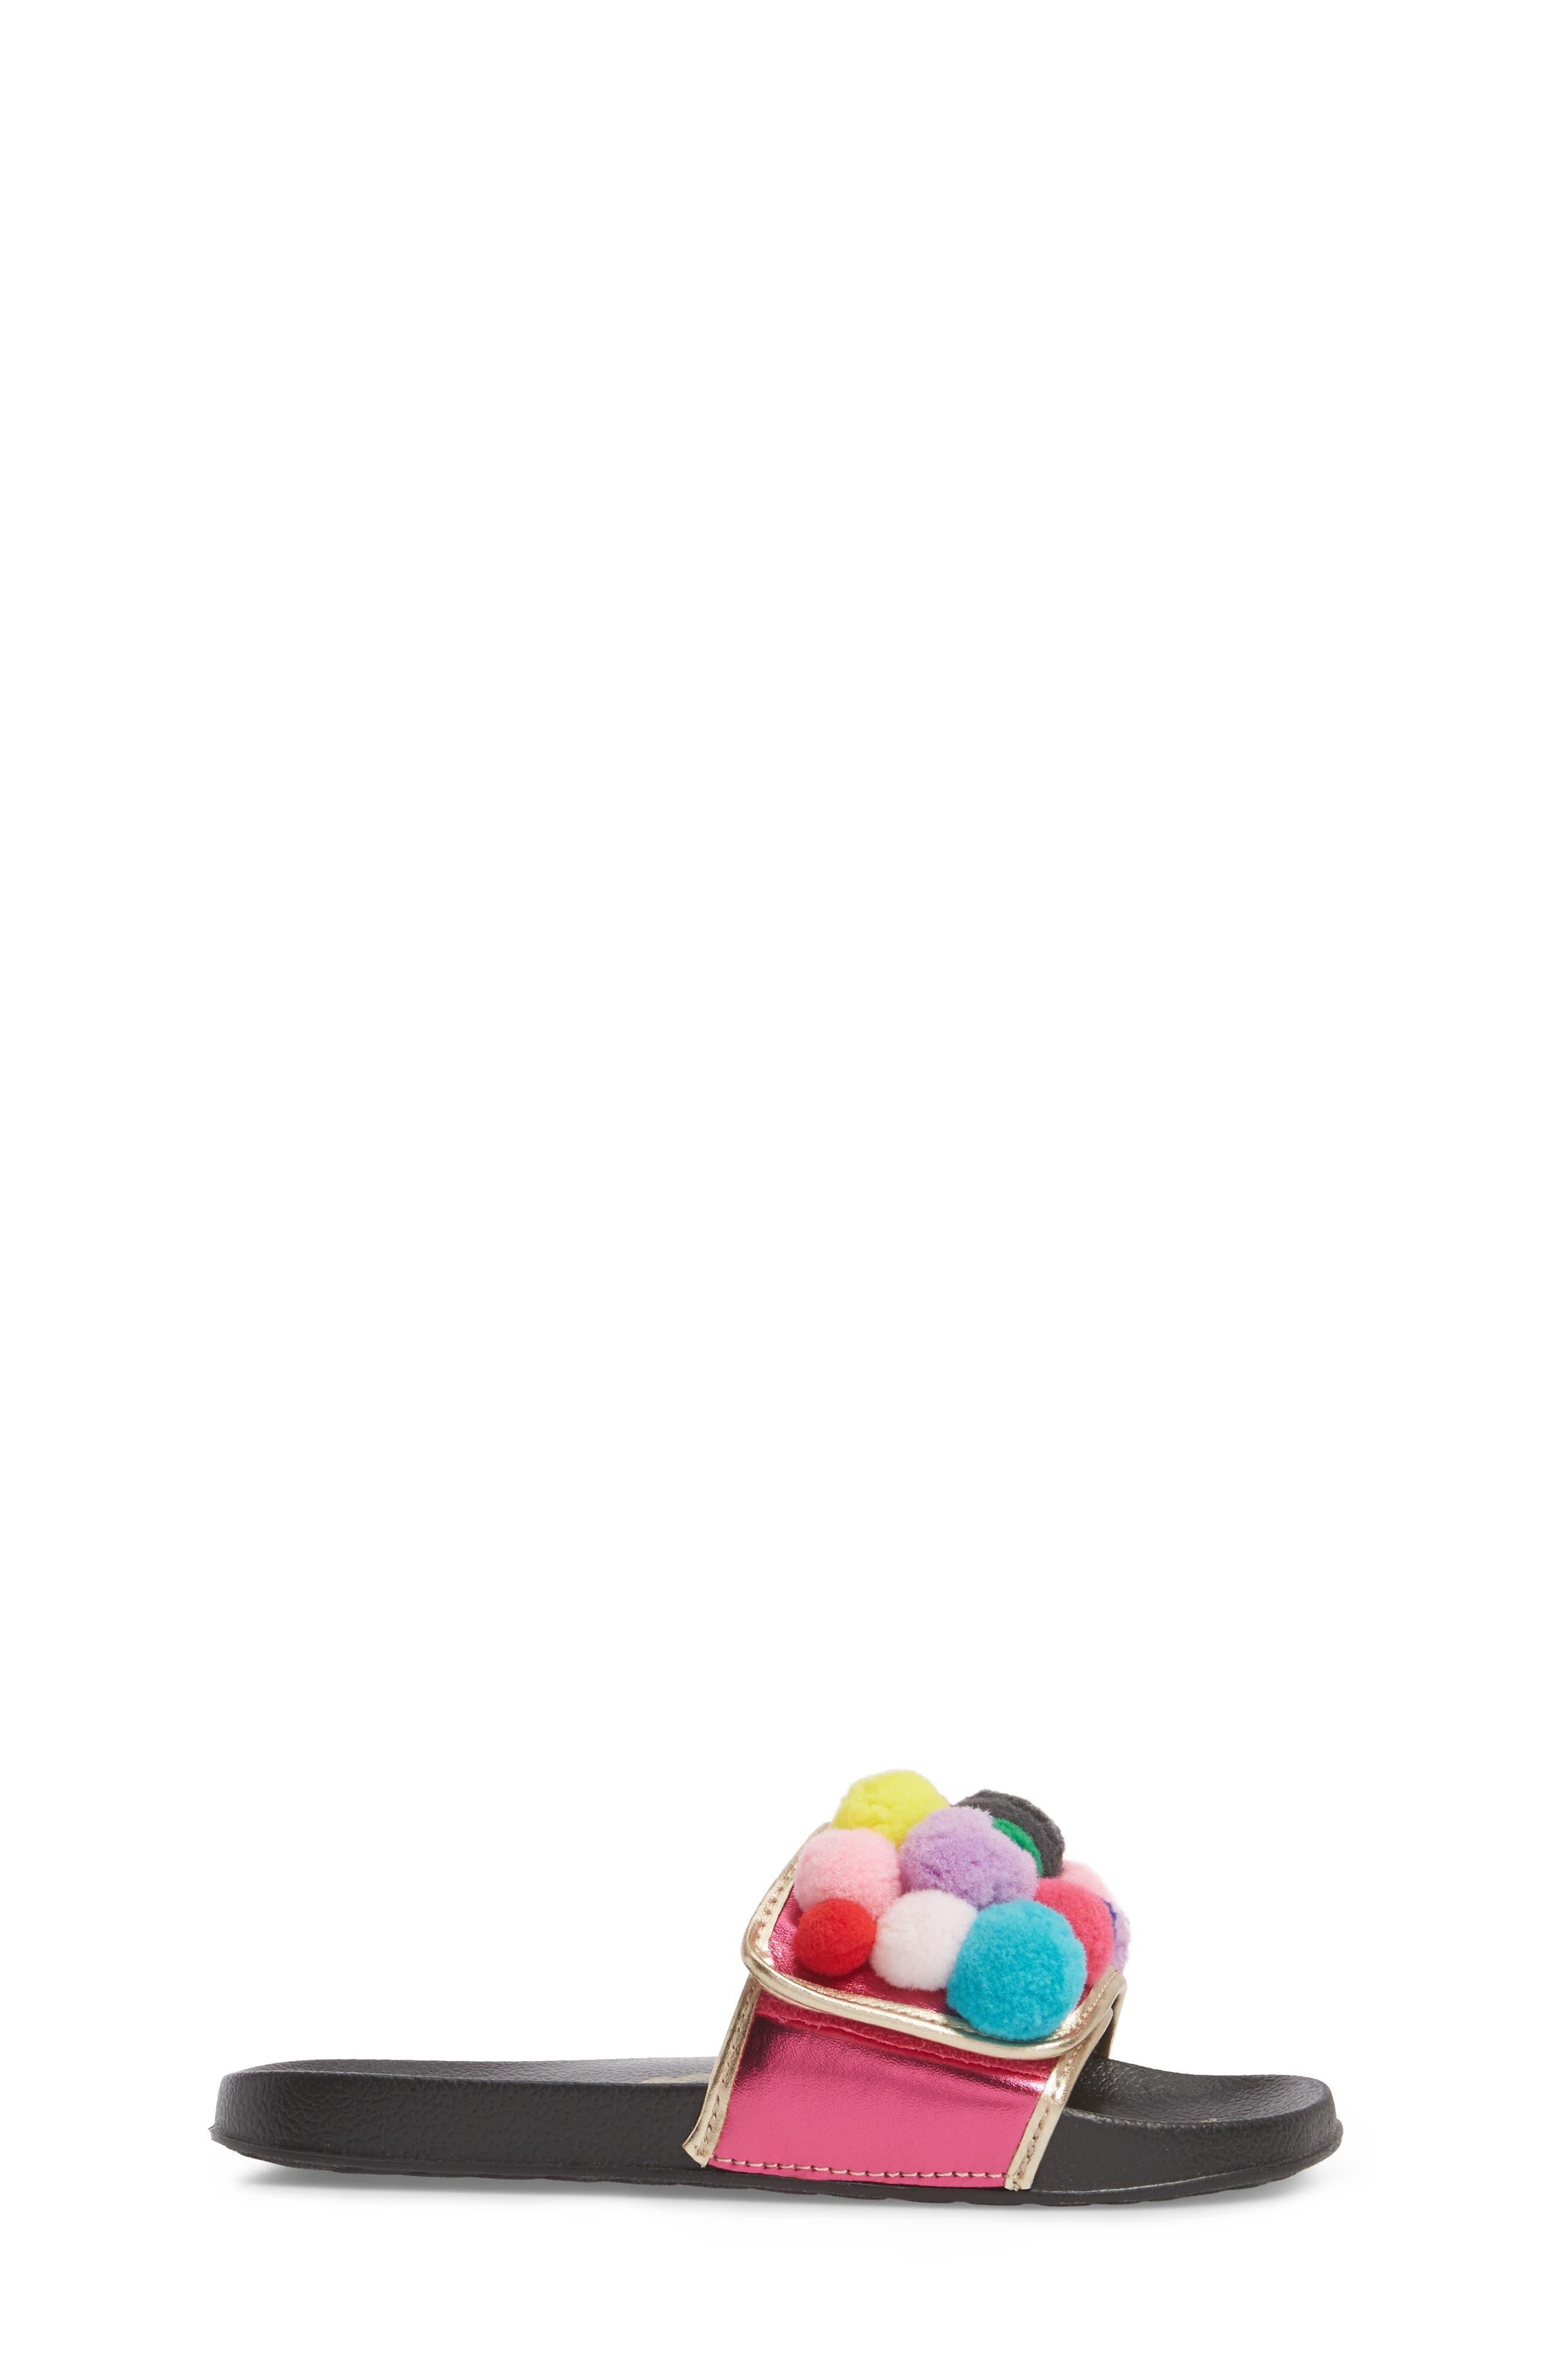 Faux Fur Mackie Cayman Sandal,                             Alternate thumbnail 3, color,                             Hot Pink Multi